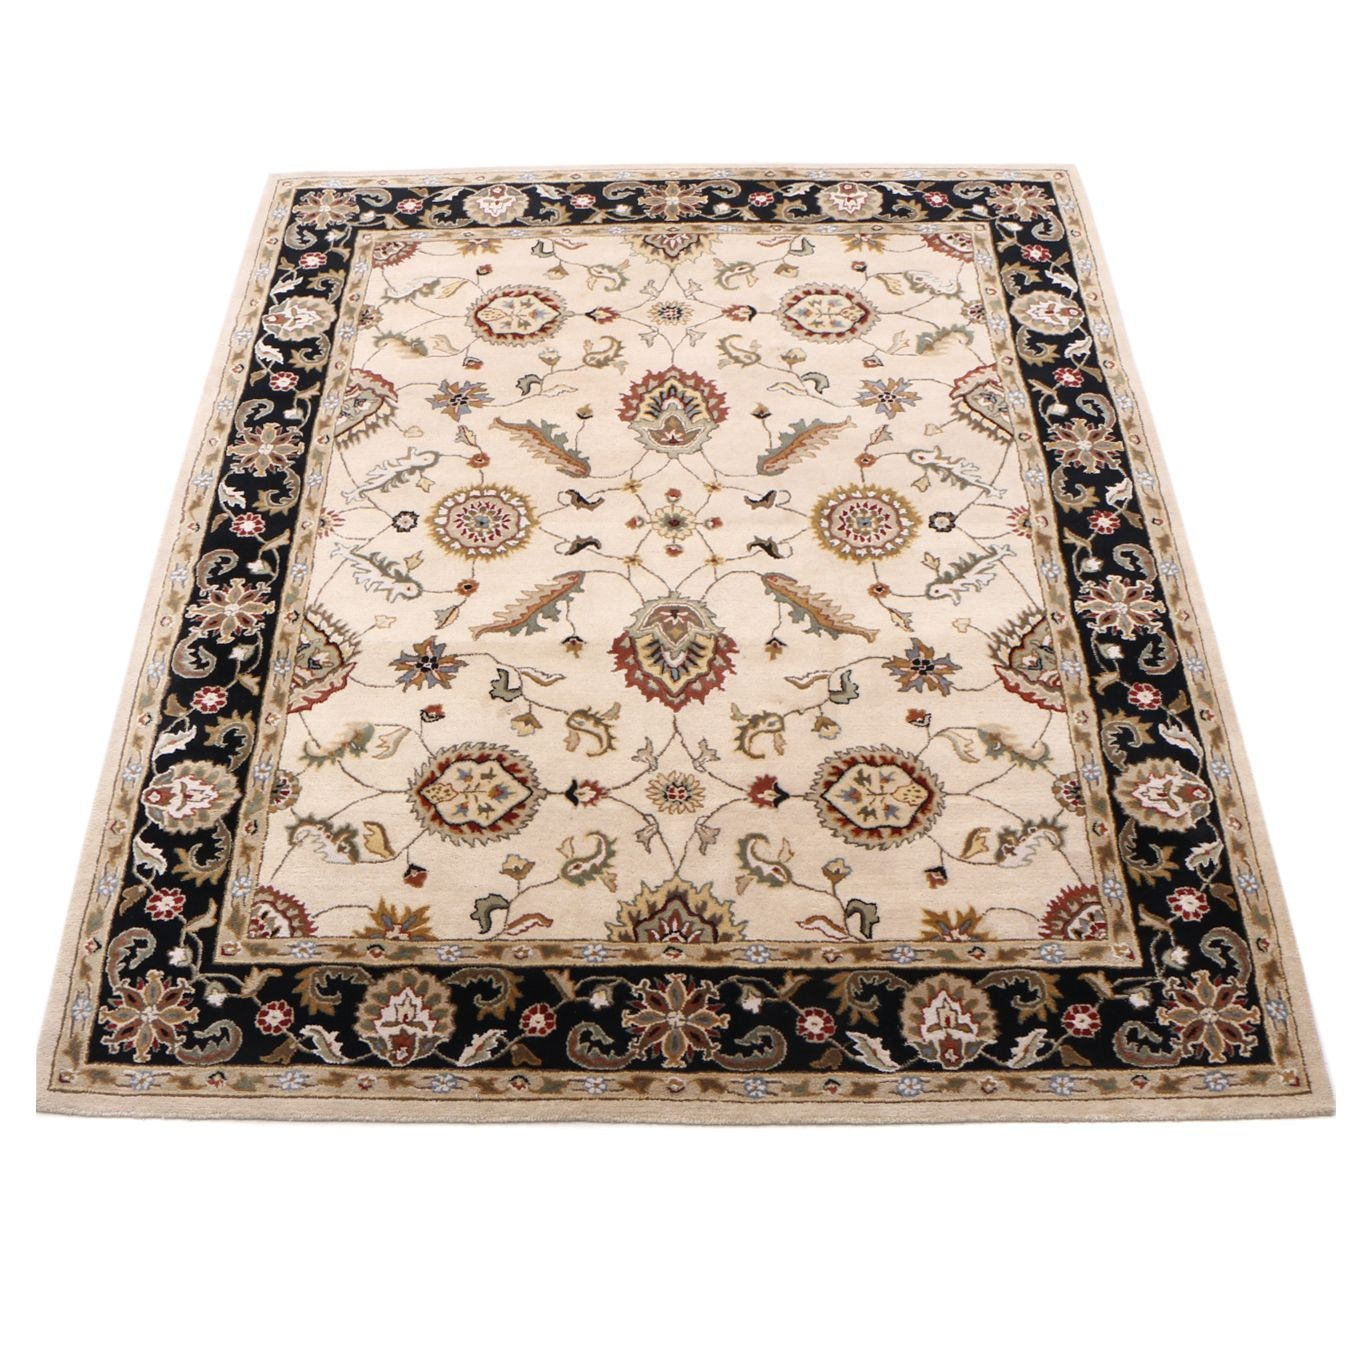 "Tufted Indian Jaipur ""Elena"" Room-Sized Rug"